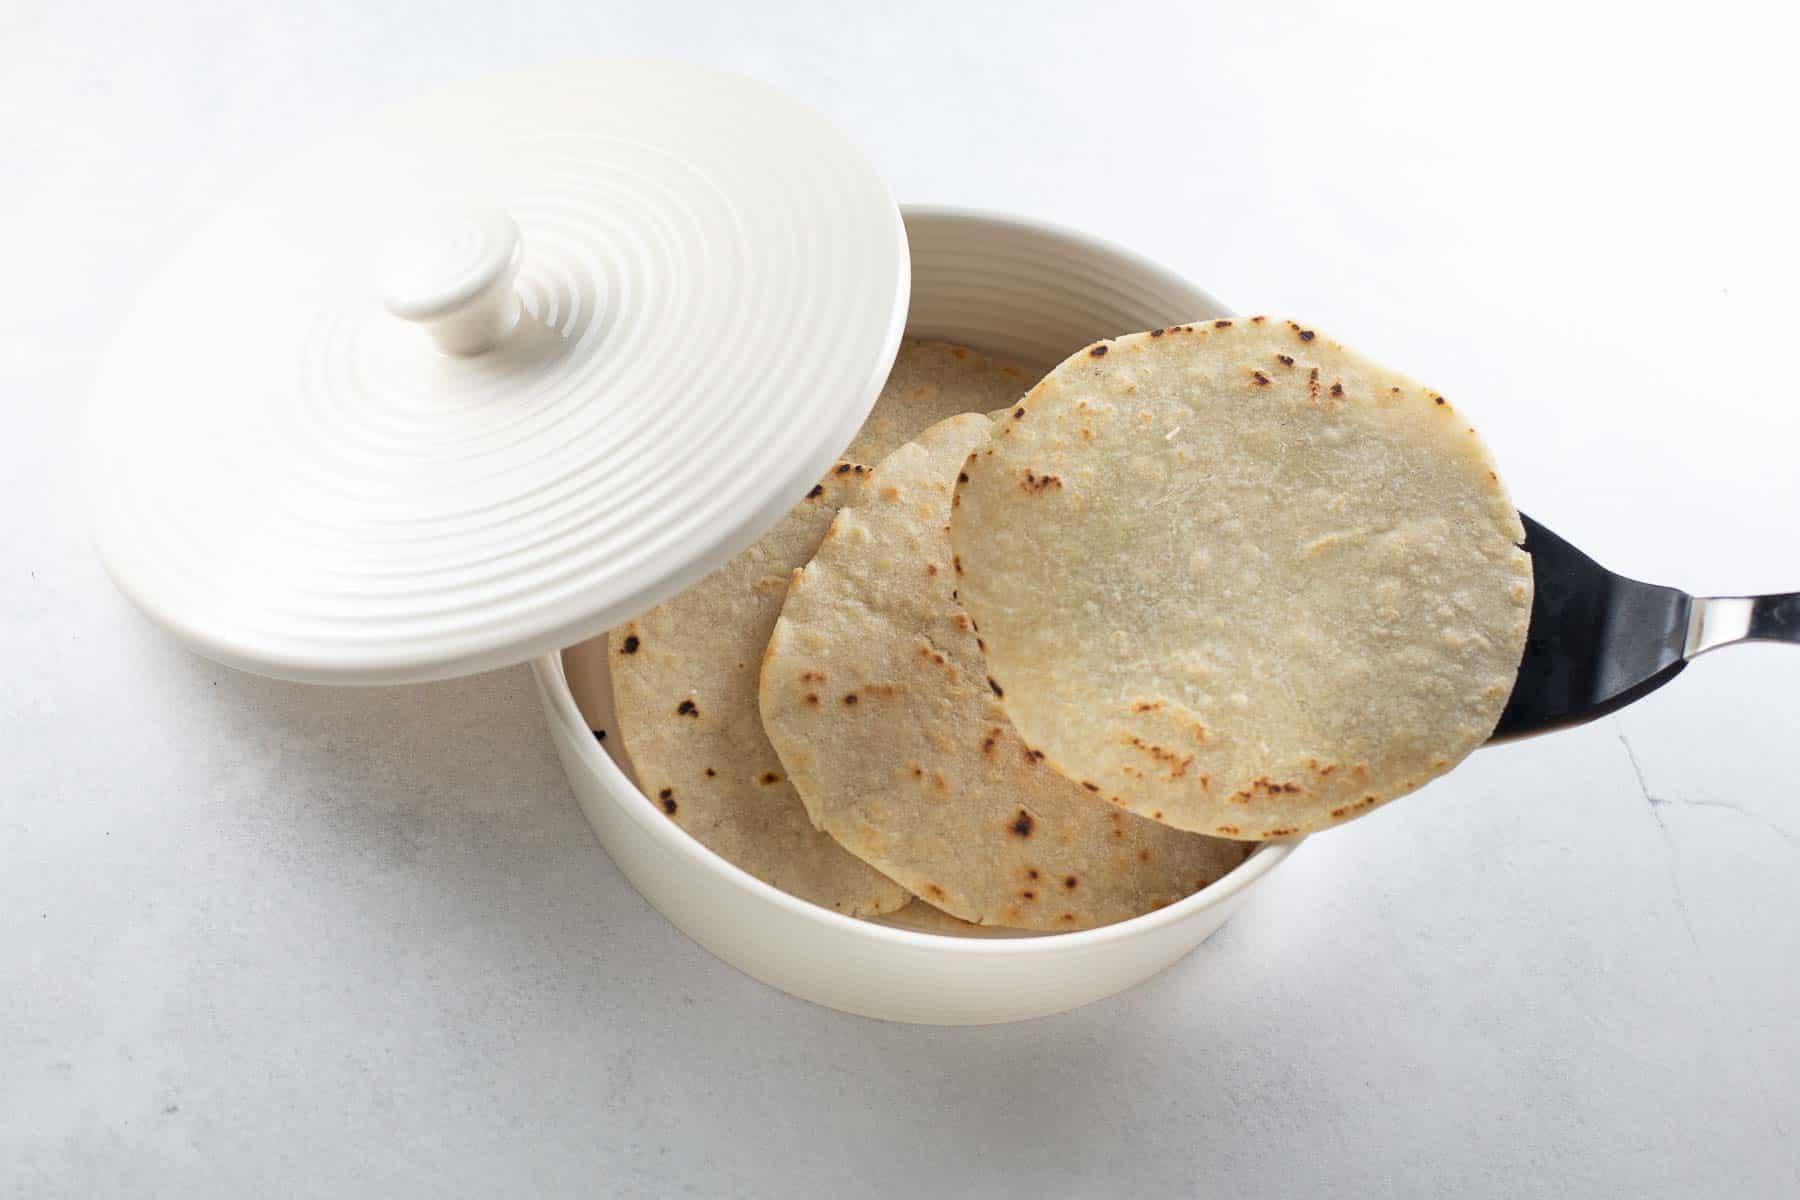 homemade gluten-free tortillas being placed in white warmer